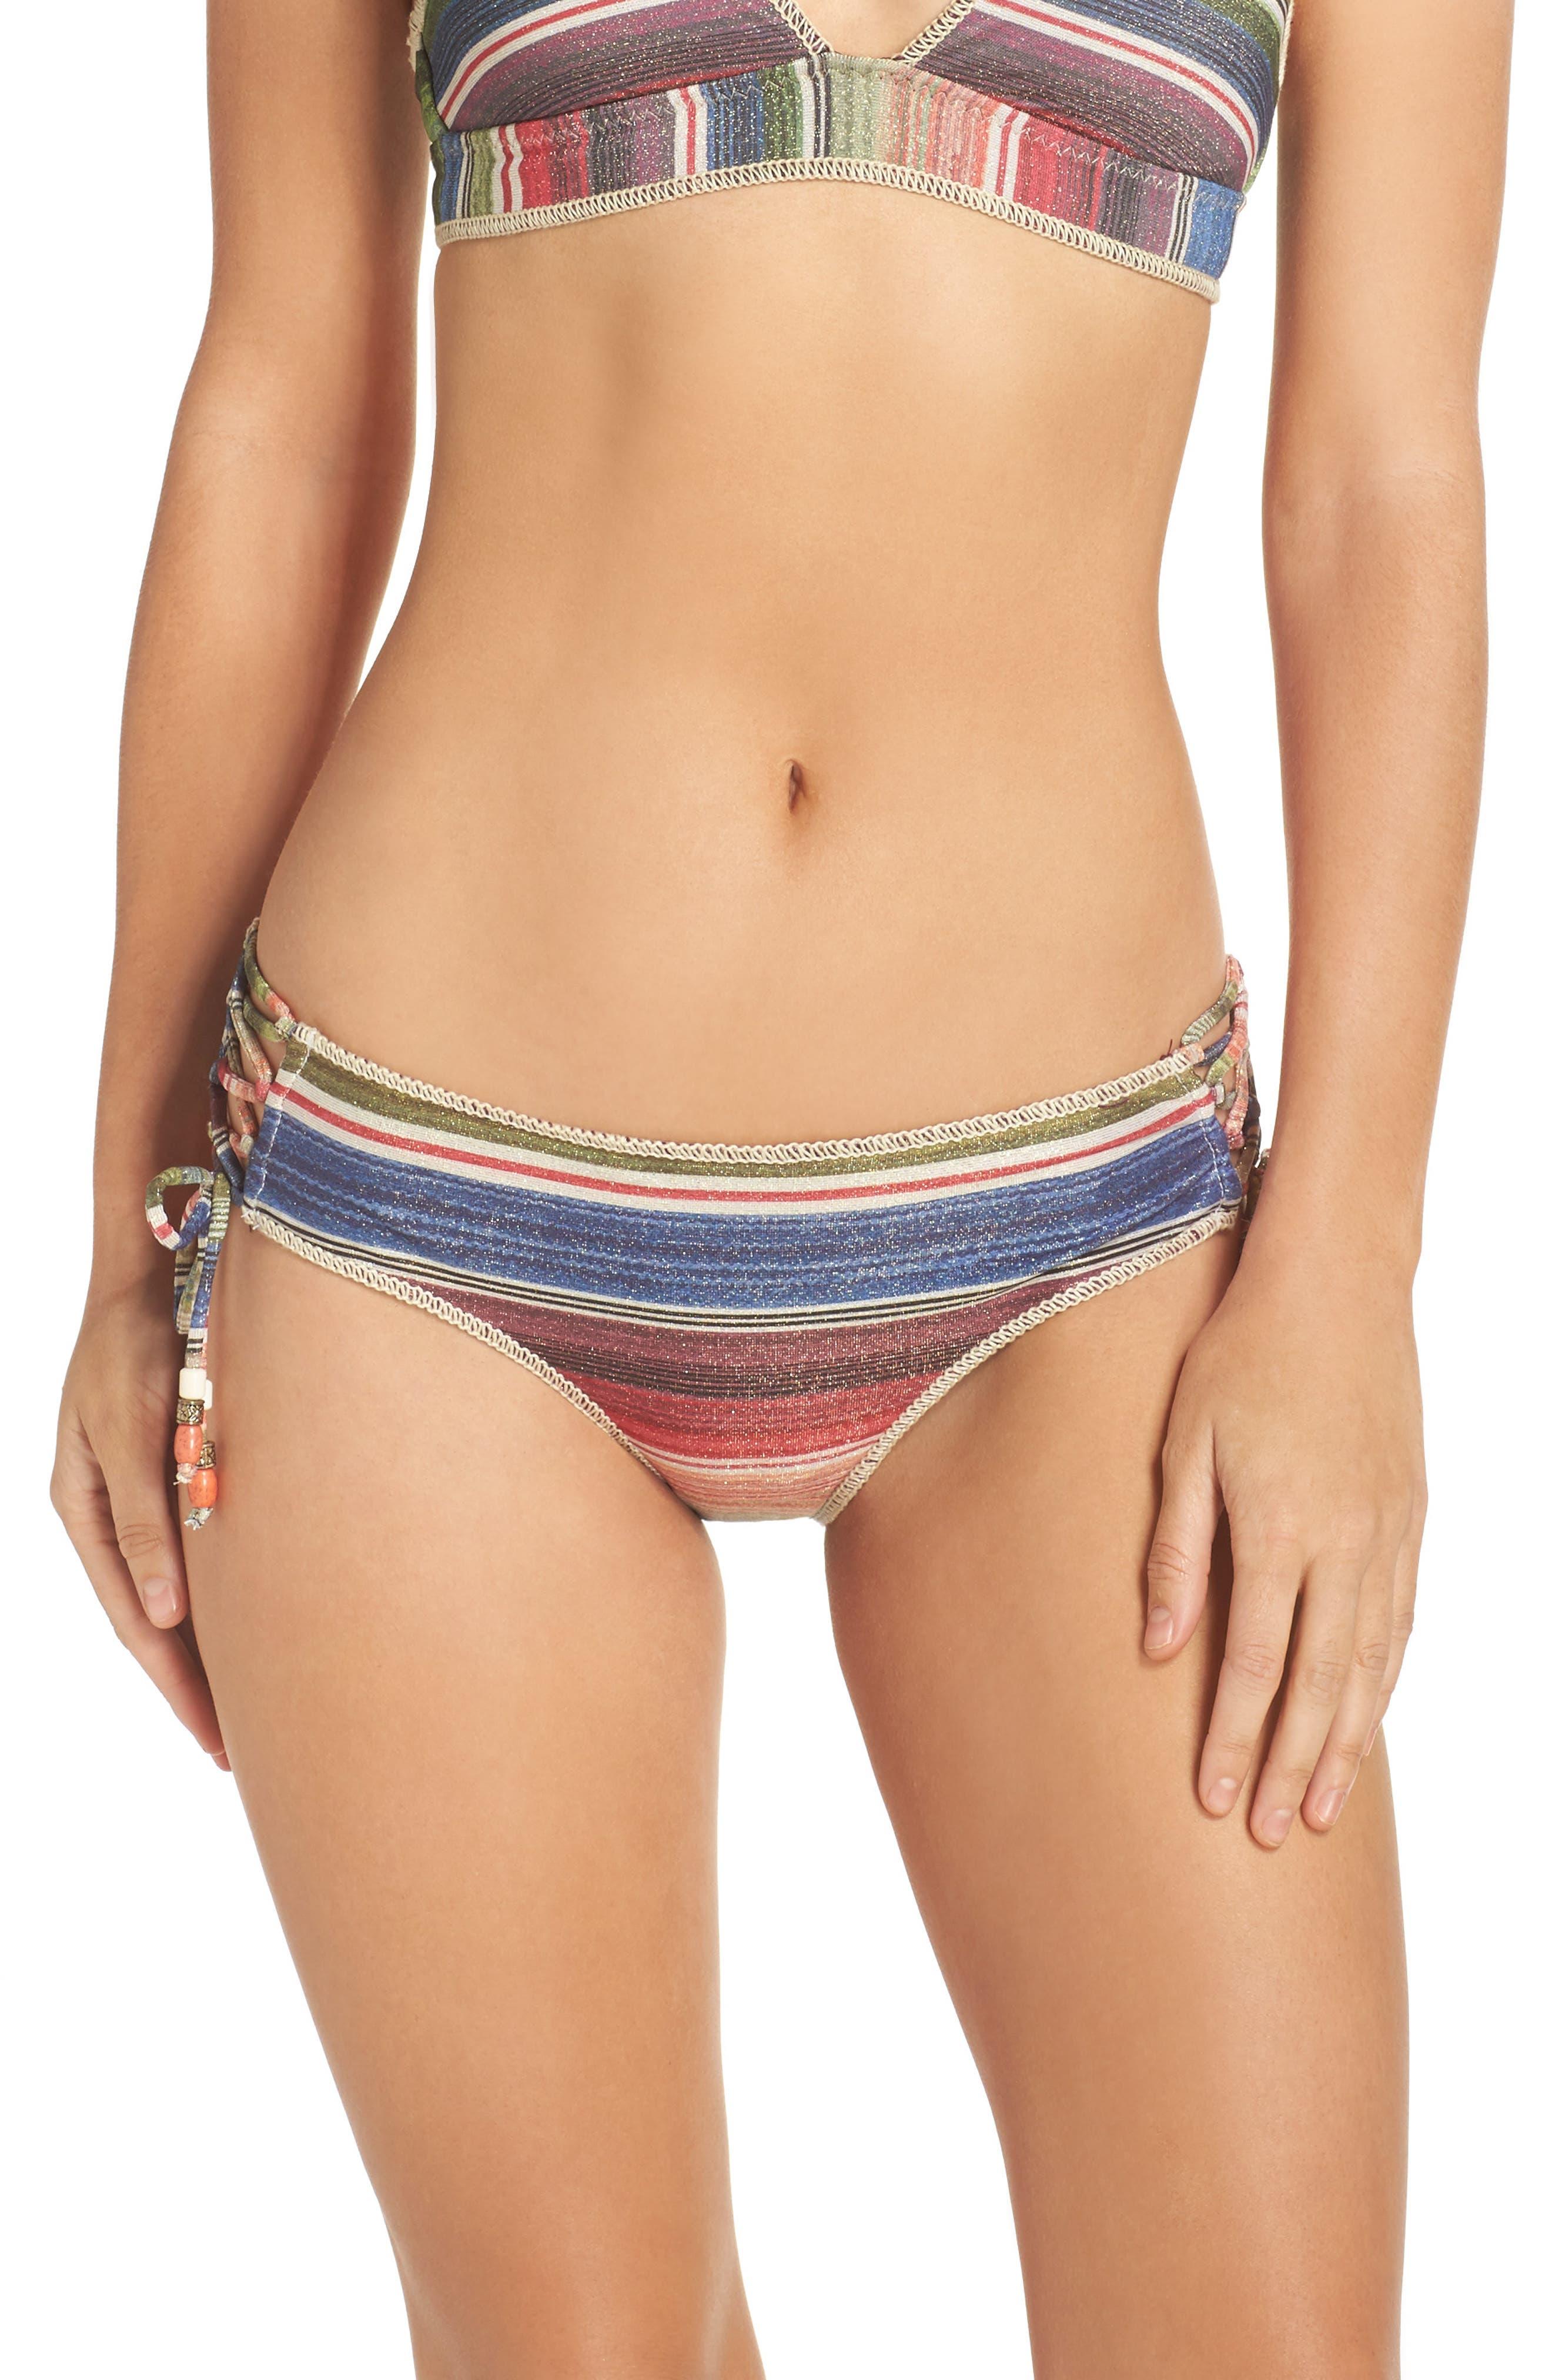 Alternate Image 1 Selected - Becca West Village Hipster Bikini Bottoms